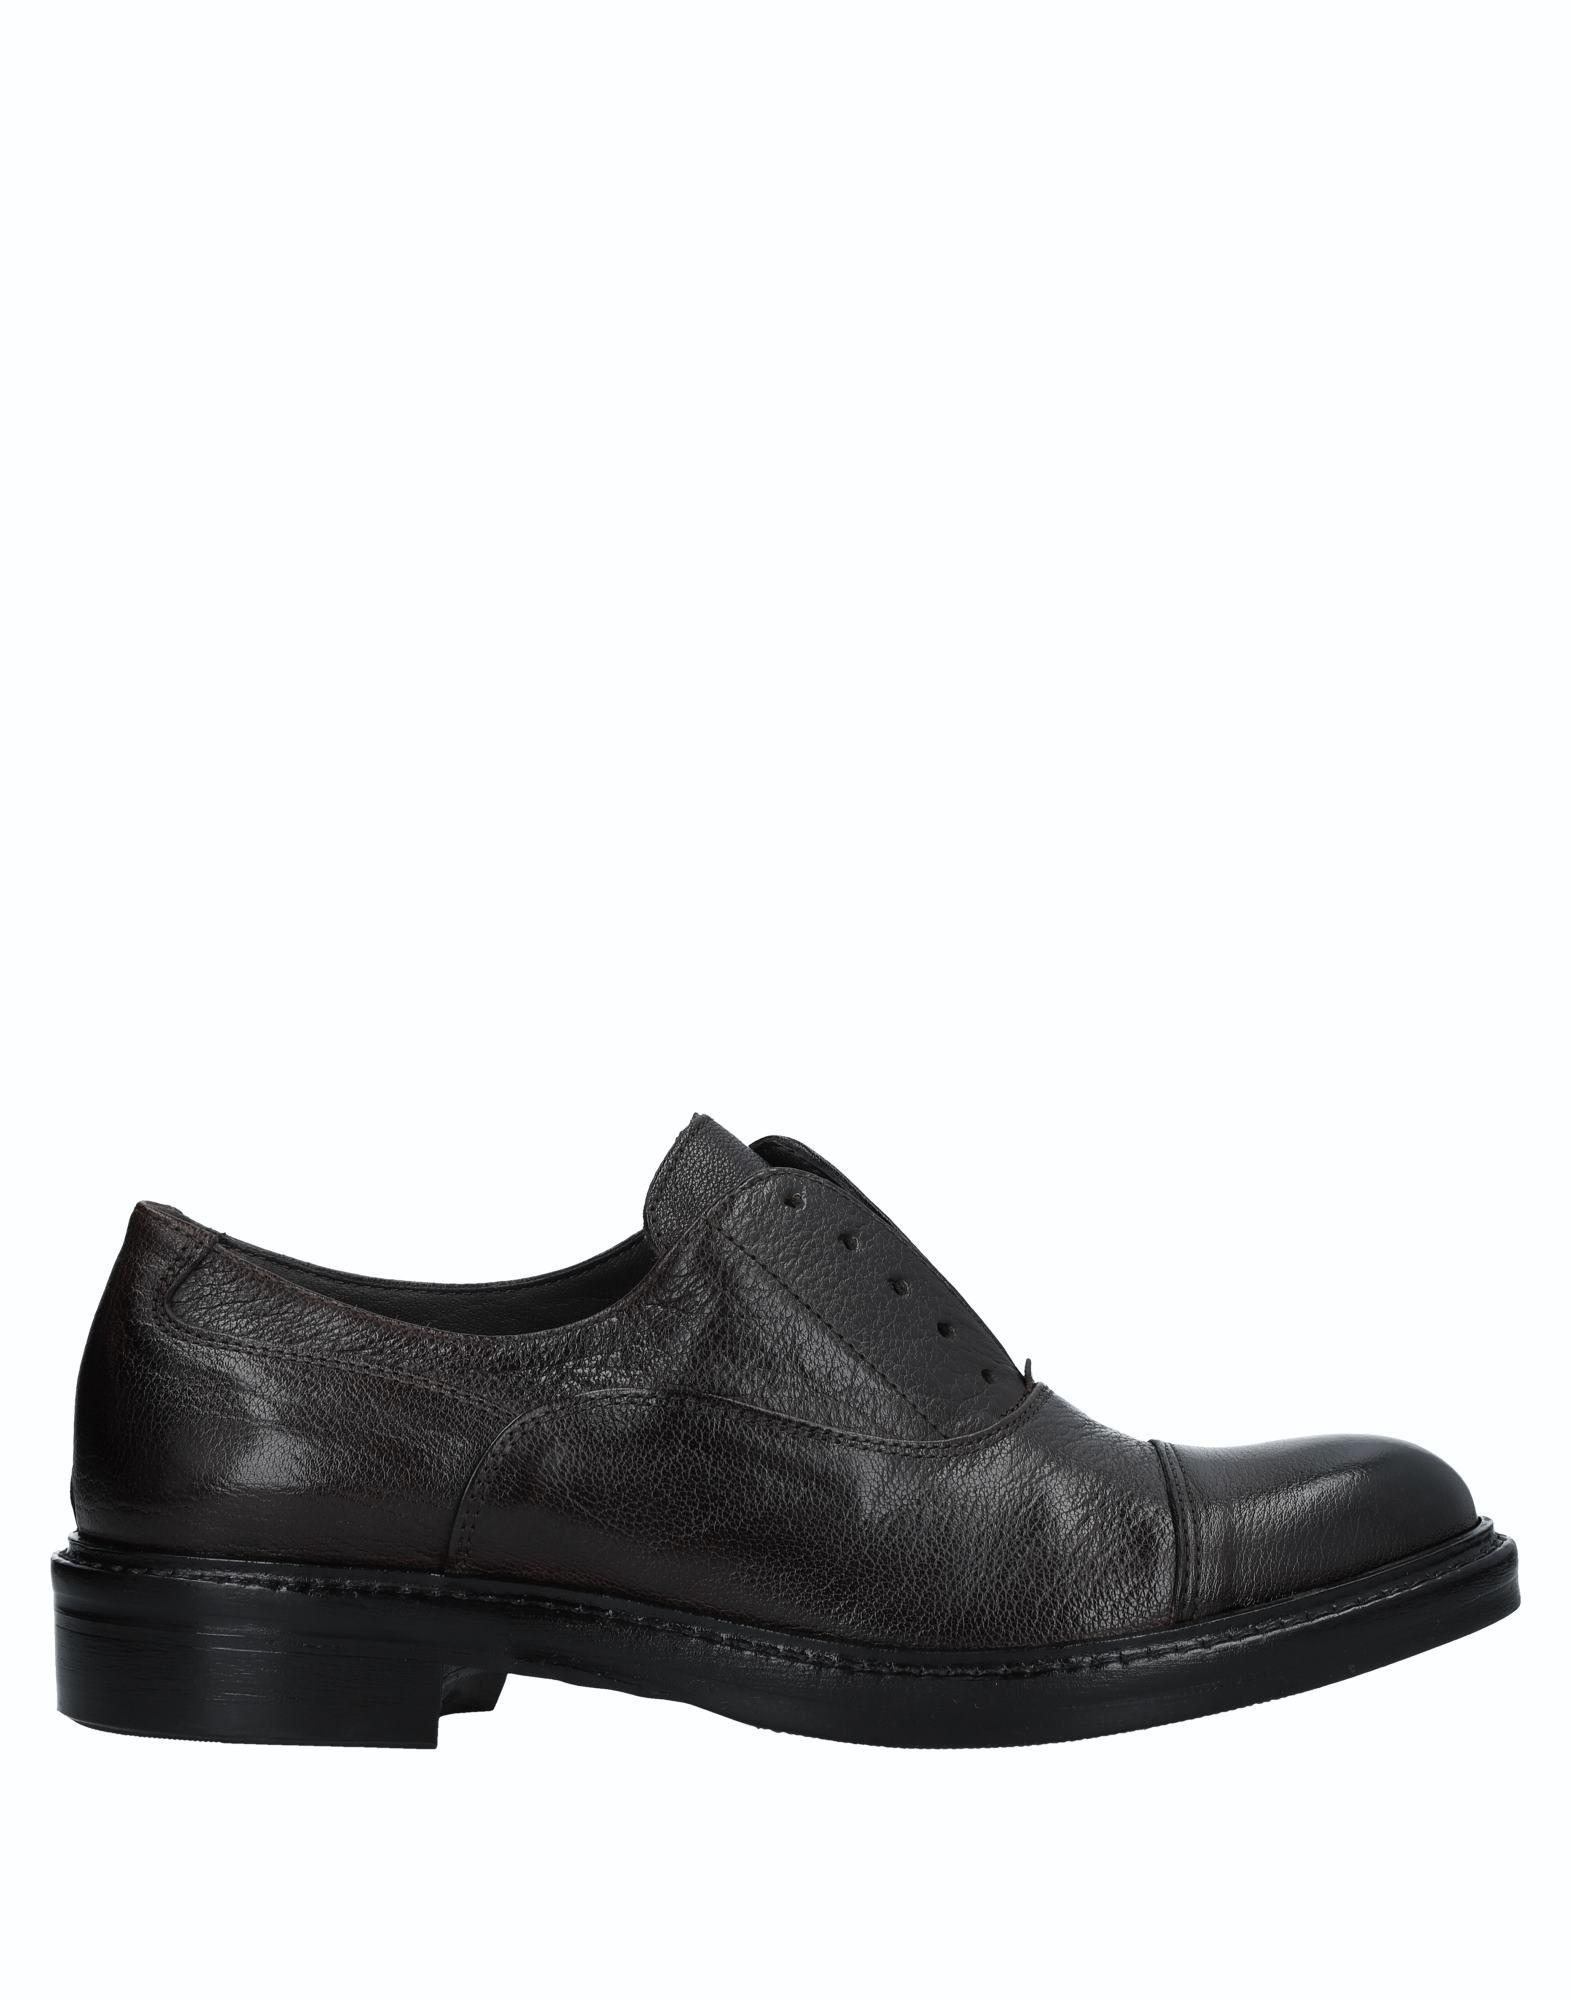 Gut um billige 11394859KM Schuhe zu tragenHundROT 100 Schnürschuhe Damen 11394859KM billige 757fb1